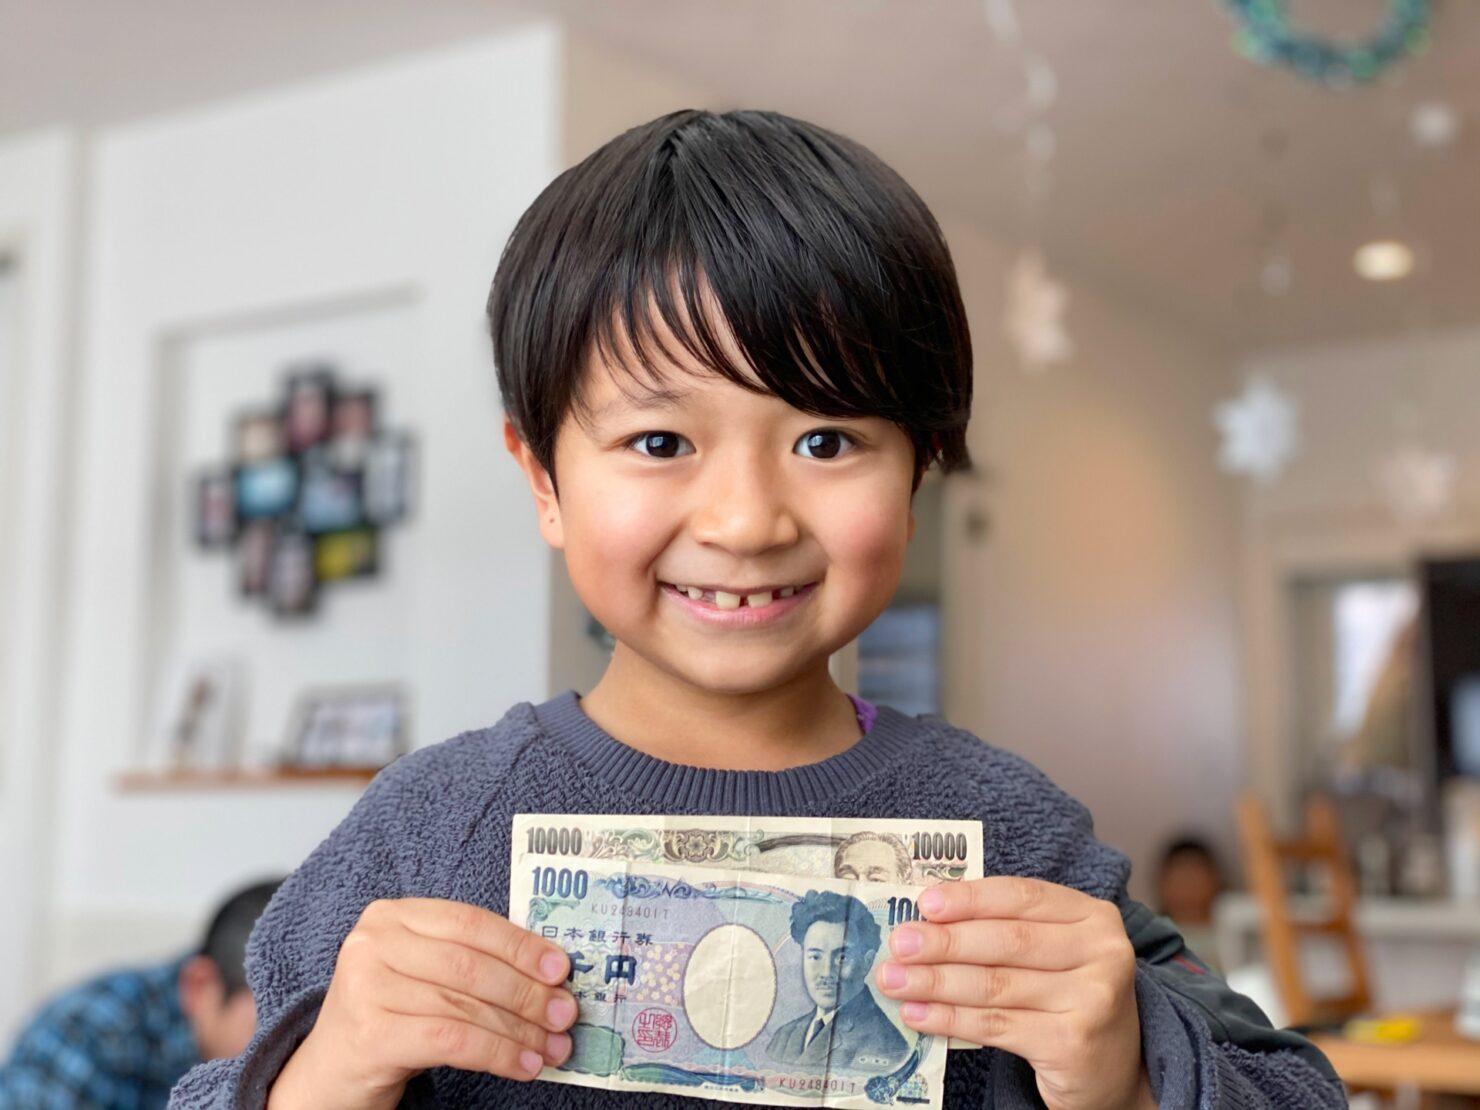 【FP監修】子供の金銭トレーニングにおすすめ! お小遣いアプリ5選